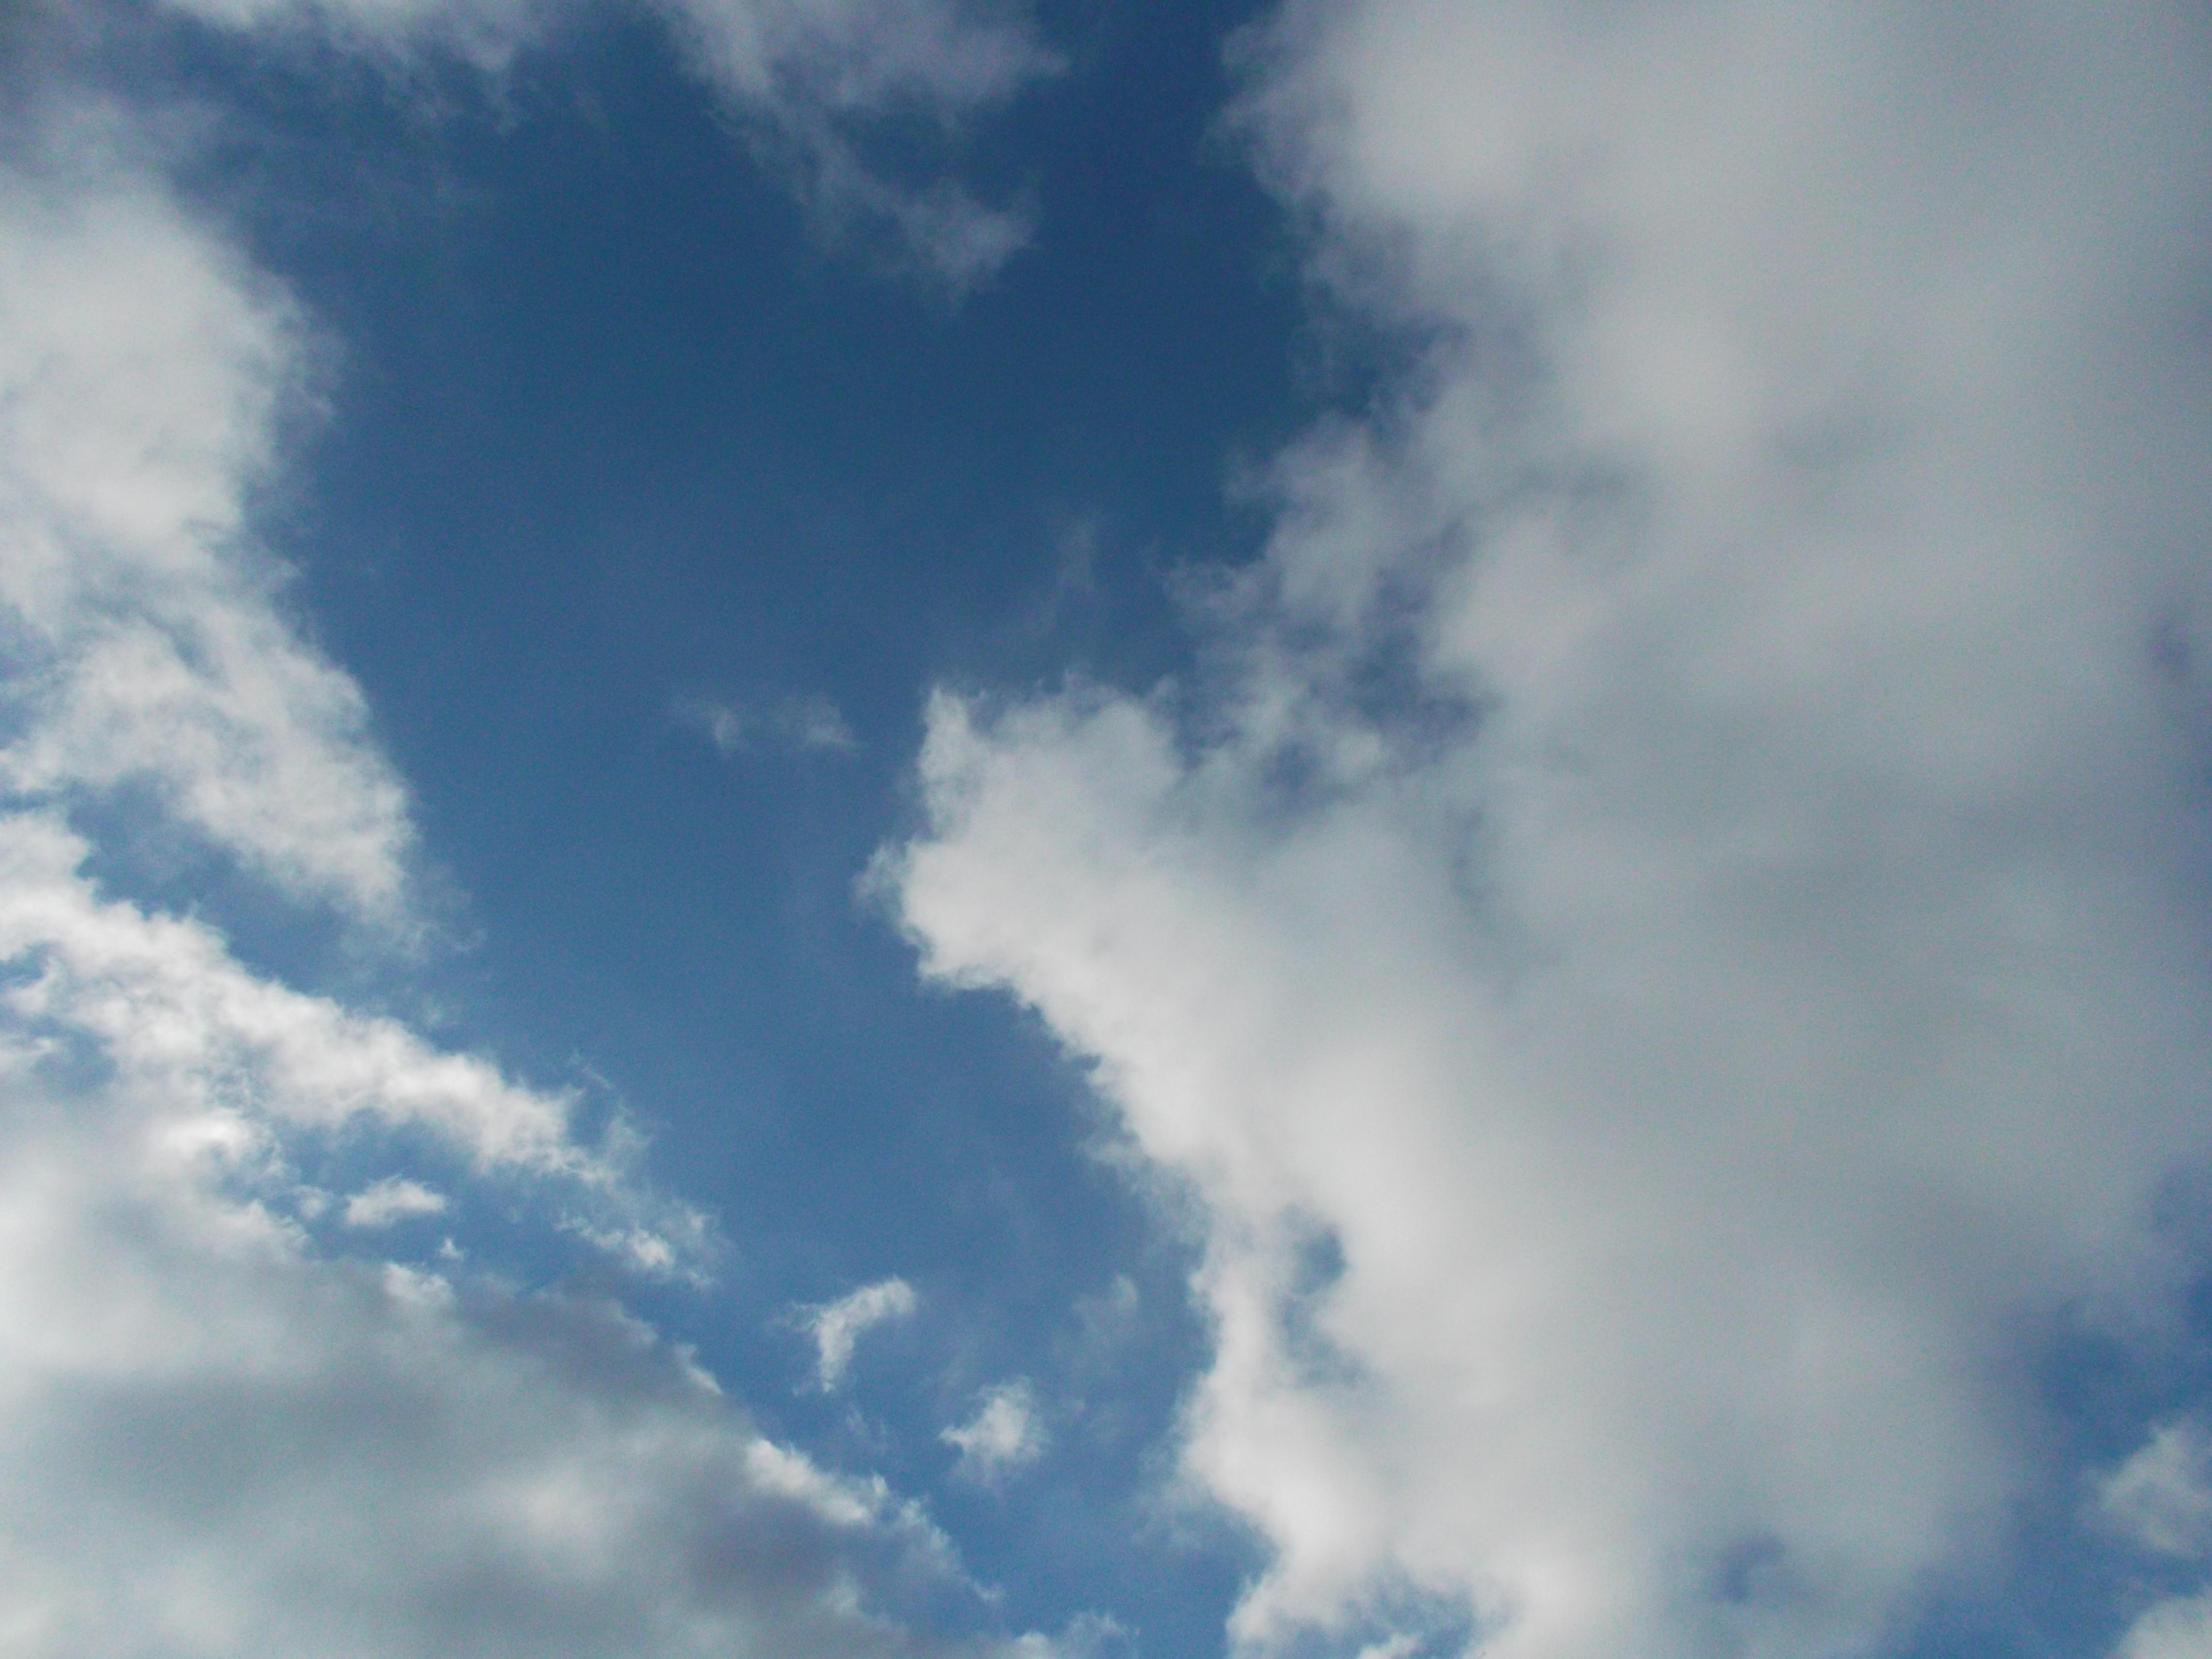 2013-02-26 Longitude -0.371 Latitude 49.182 Altitude 13 Heure 15h29